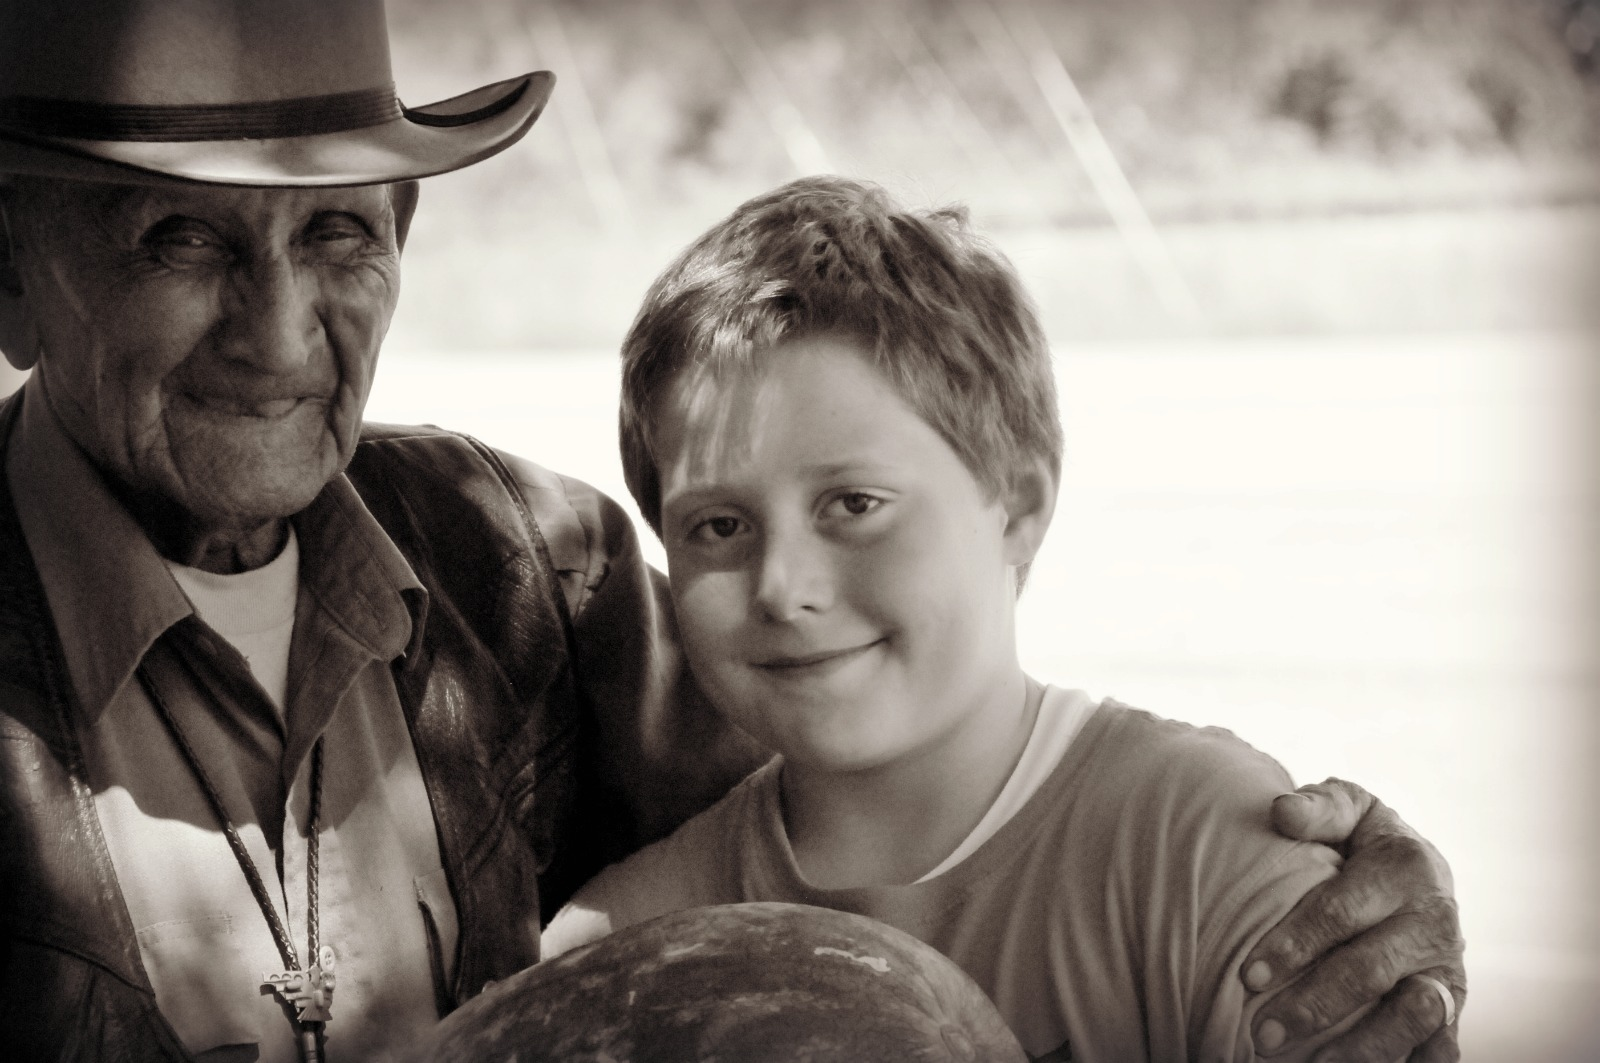 Tex and Boy